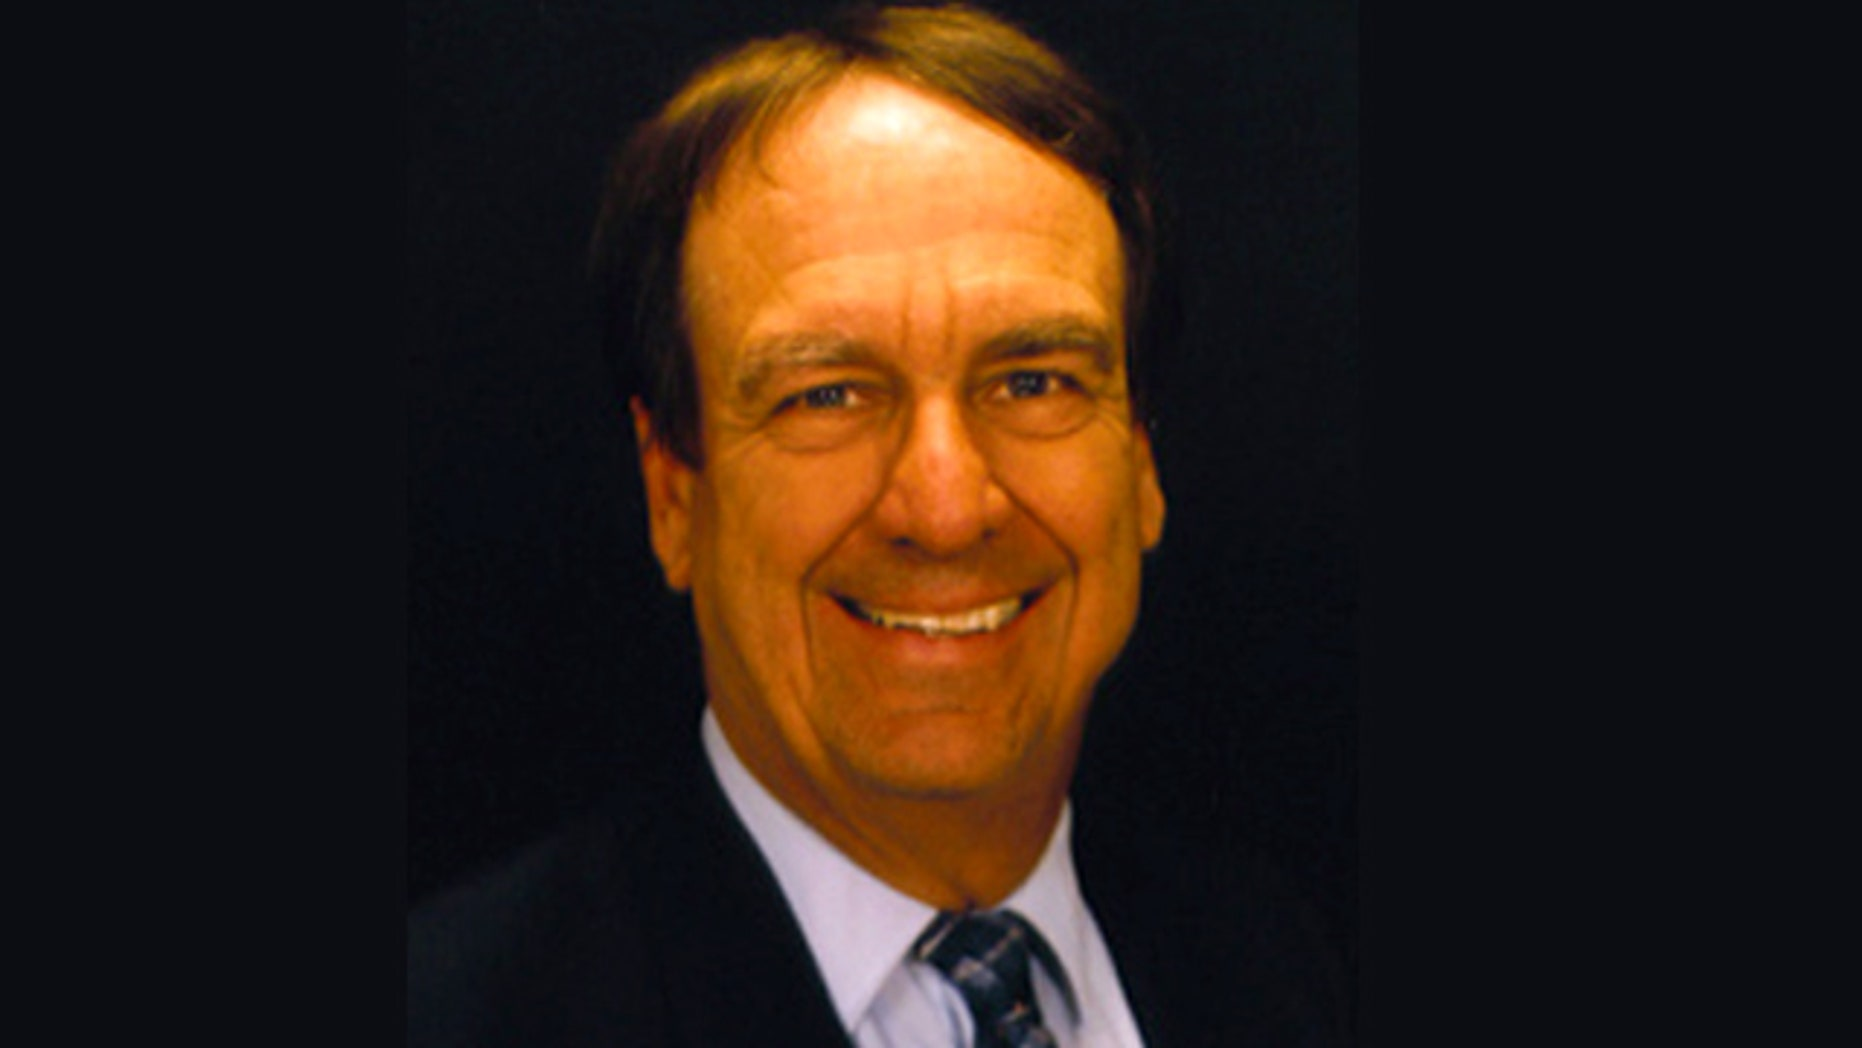 Dr. James Enstrom